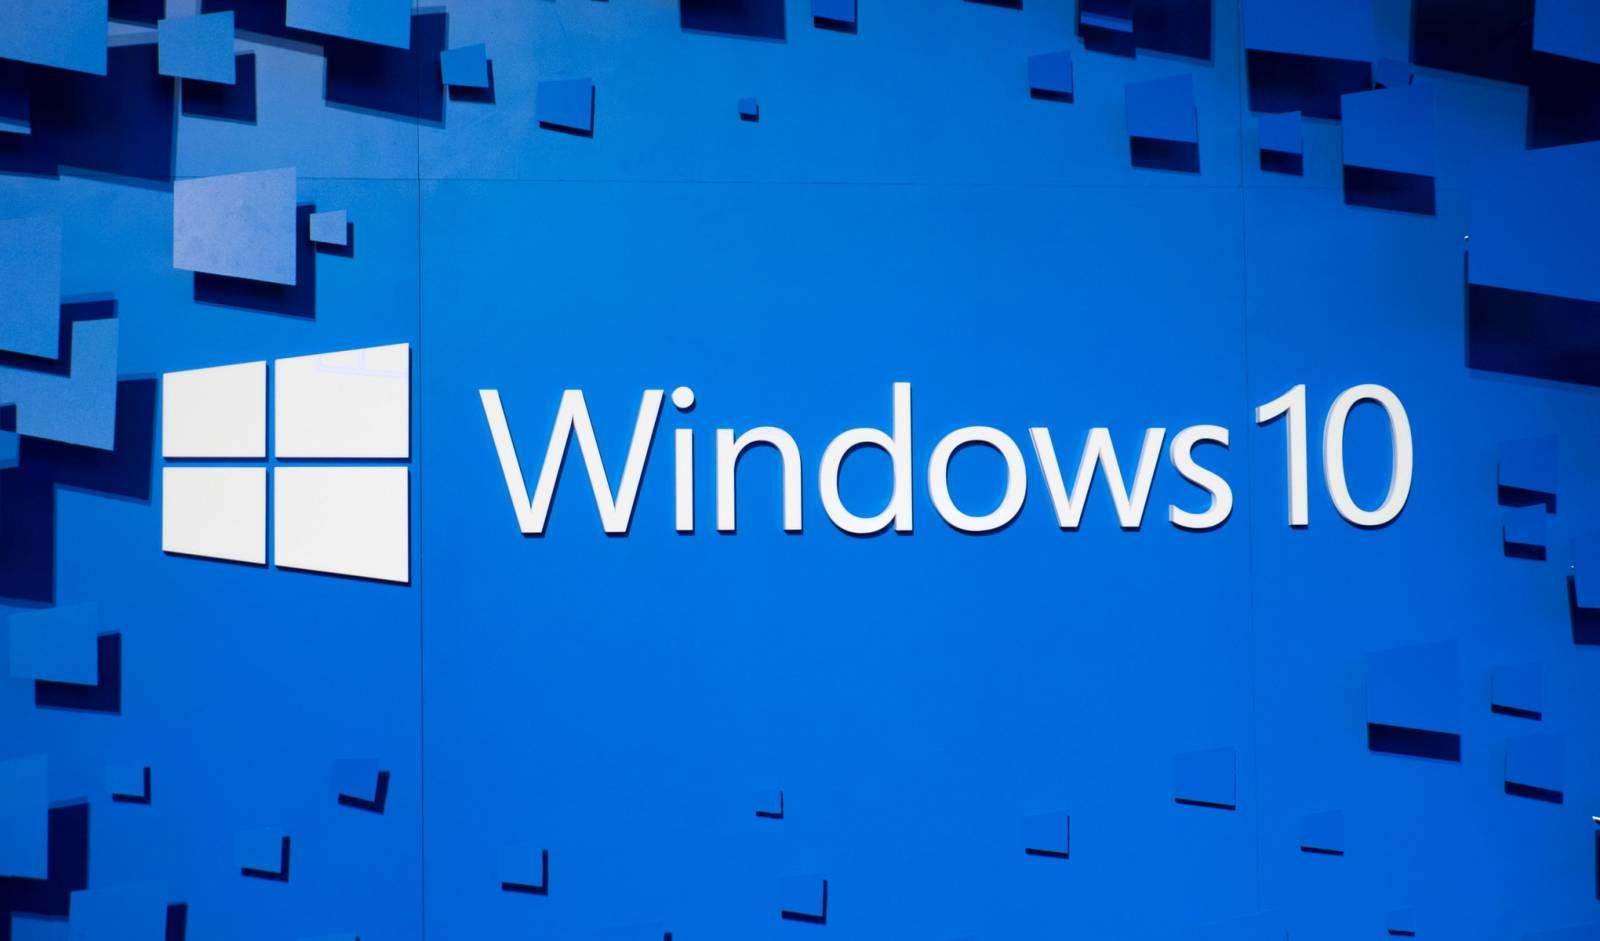 Windows 10 modern